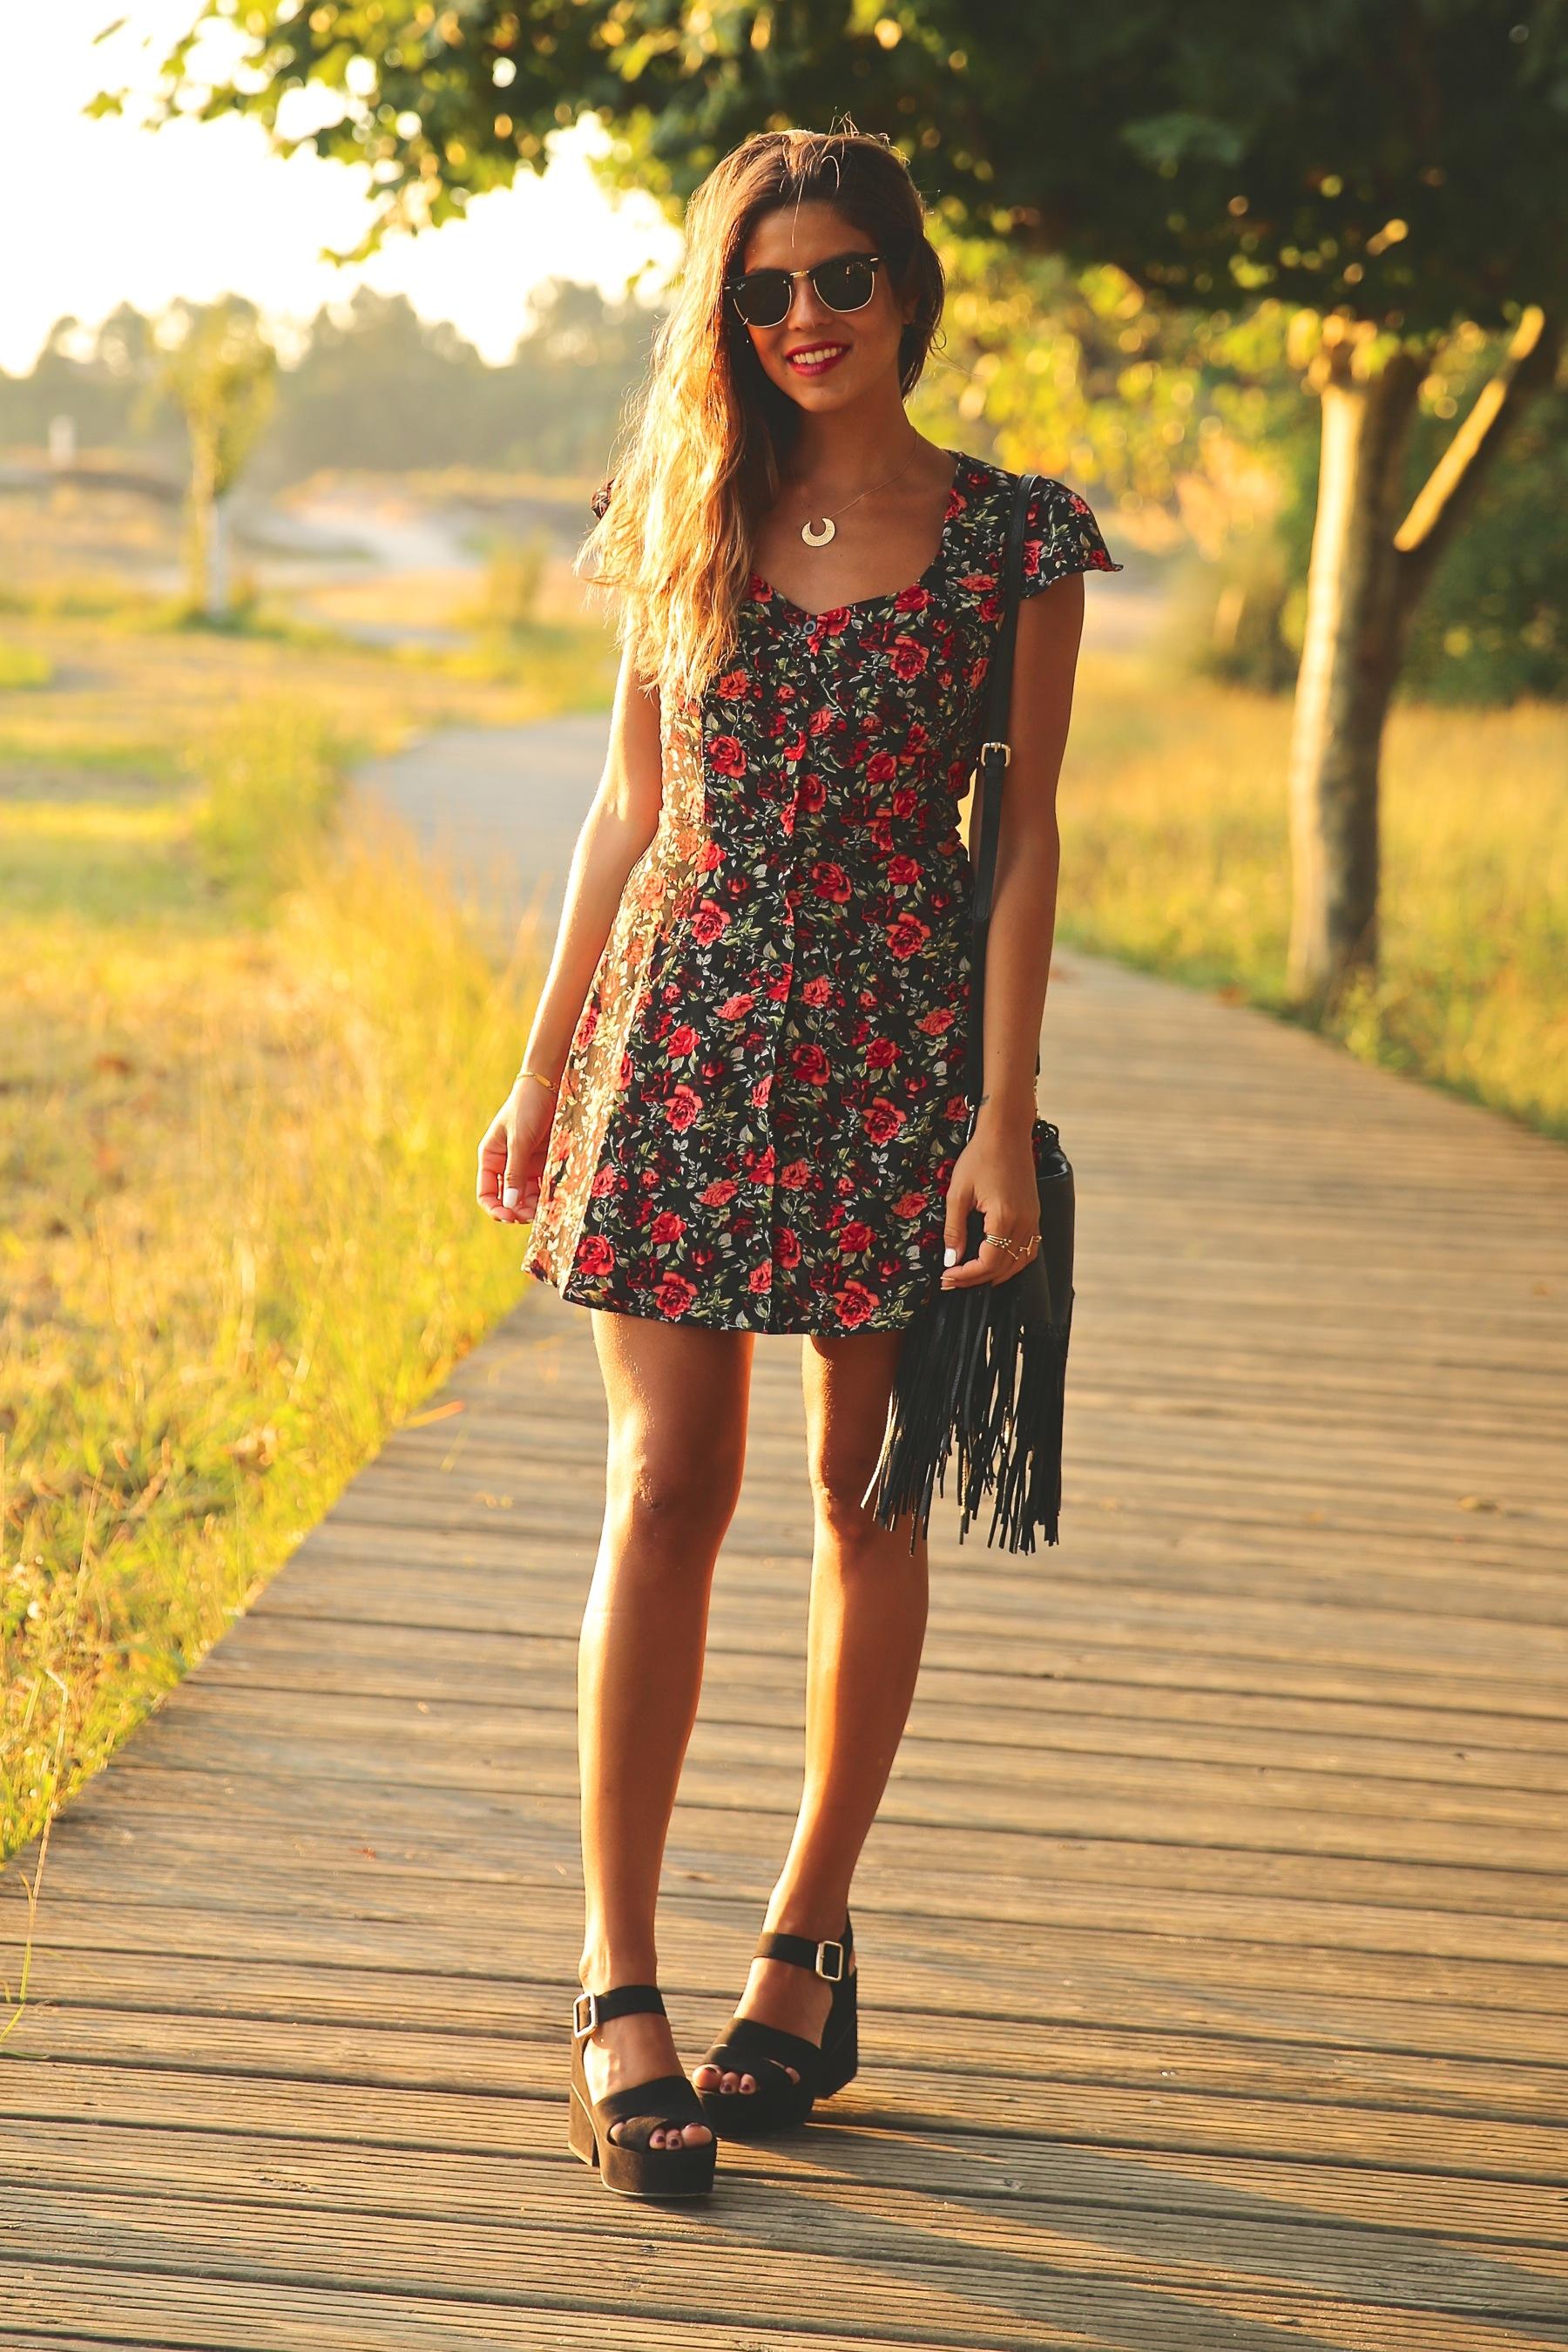 trendy_taste-look-outfit-street_style-ootd-blog-blogger-fashion_spain-moda_españa-flower_print-dress-vestido-flores-sandalias_negras-black_sandals-platforms-sunset-playa-beach-summer-12